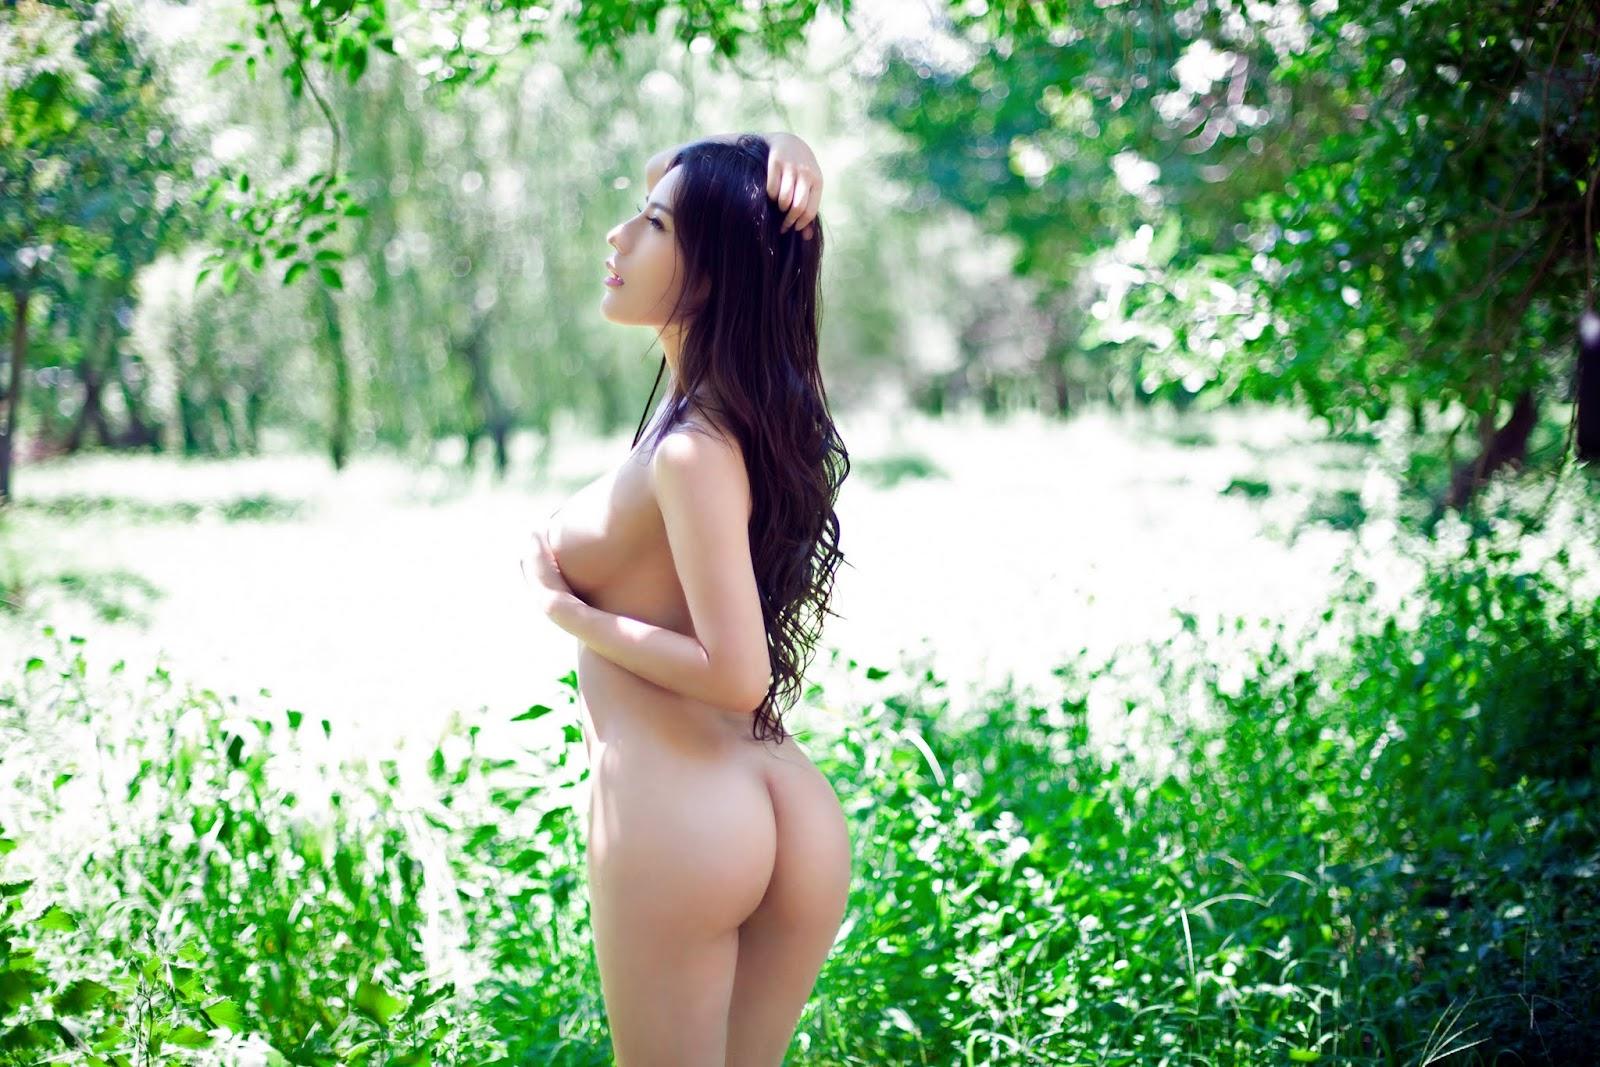 %25C2%25AC%252BO 39 - Hot Sexy Model TUIGIRL NO.46 Nude